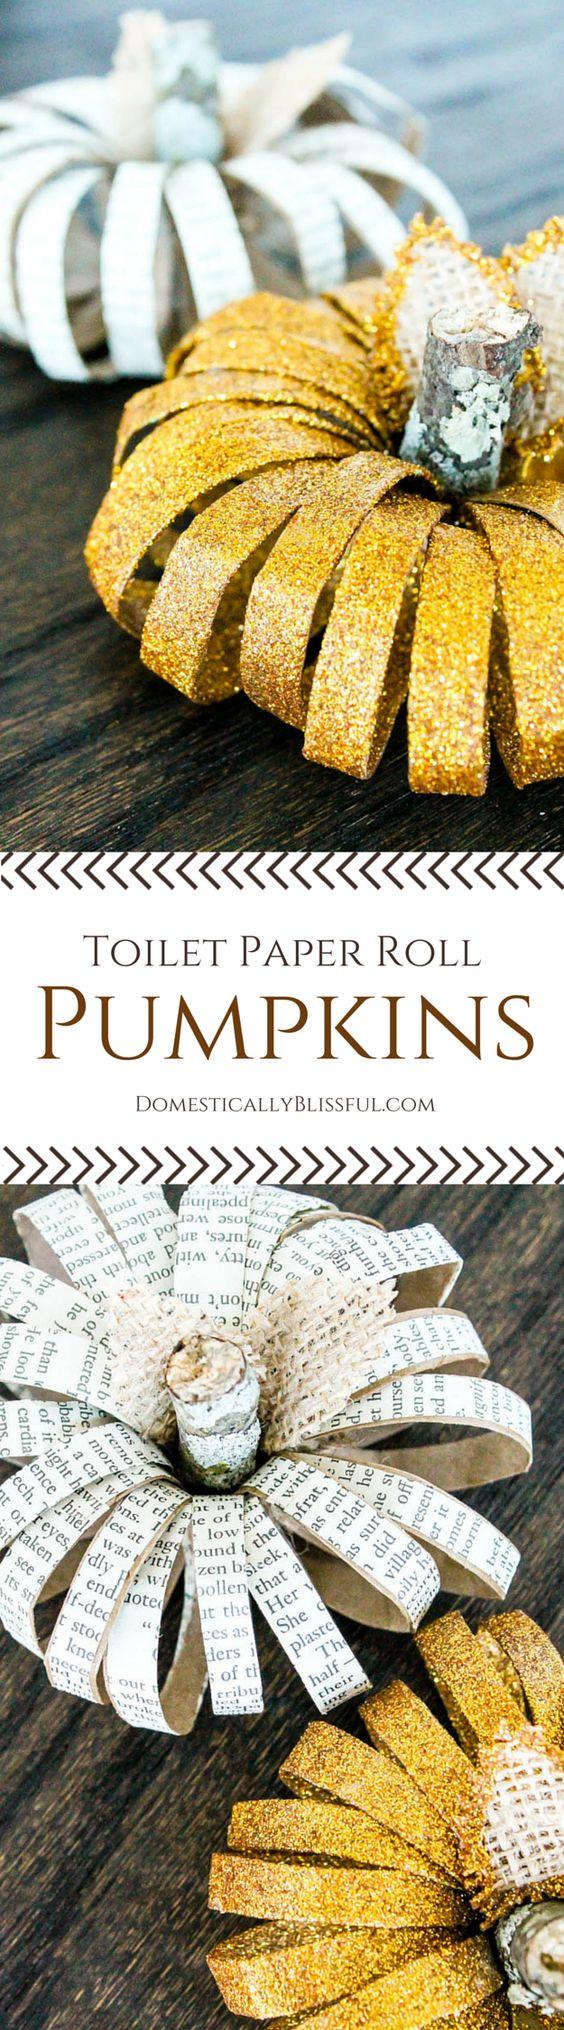 Pumpkin toilet paper roll décor